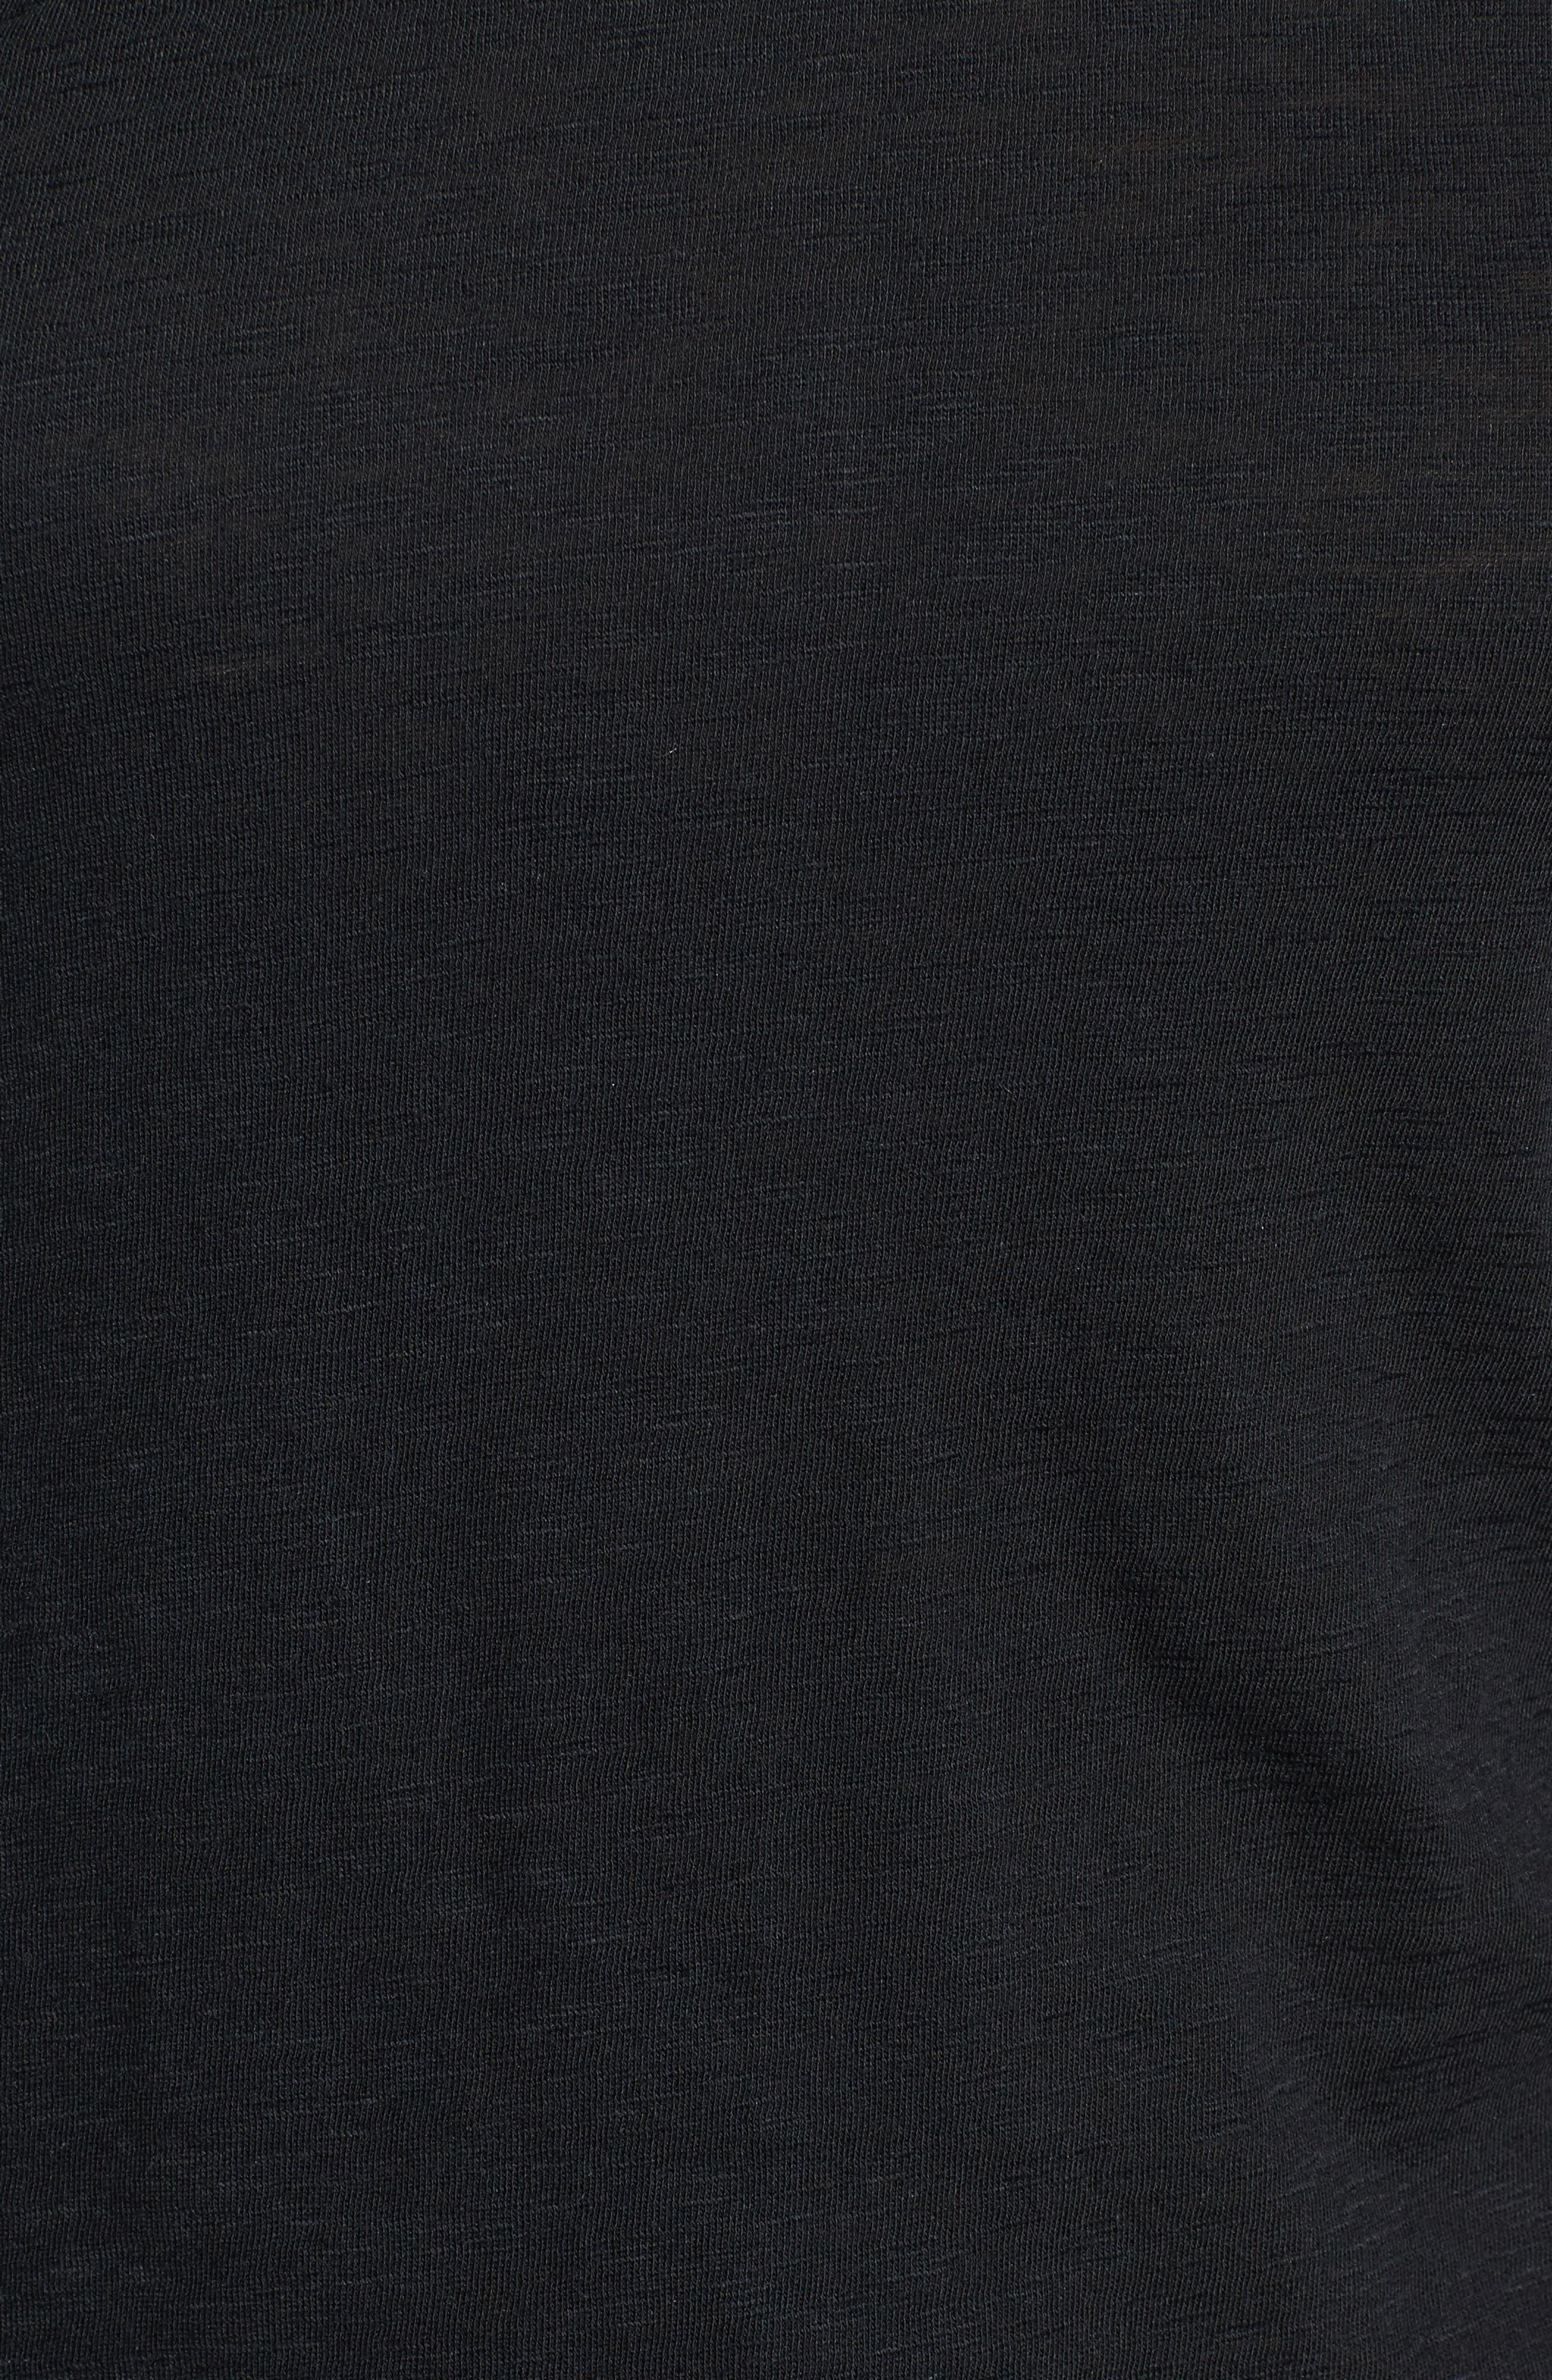 Long Sleeve Crewneck Tee,                             Alternate thumbnail 7, color,                             BLACK